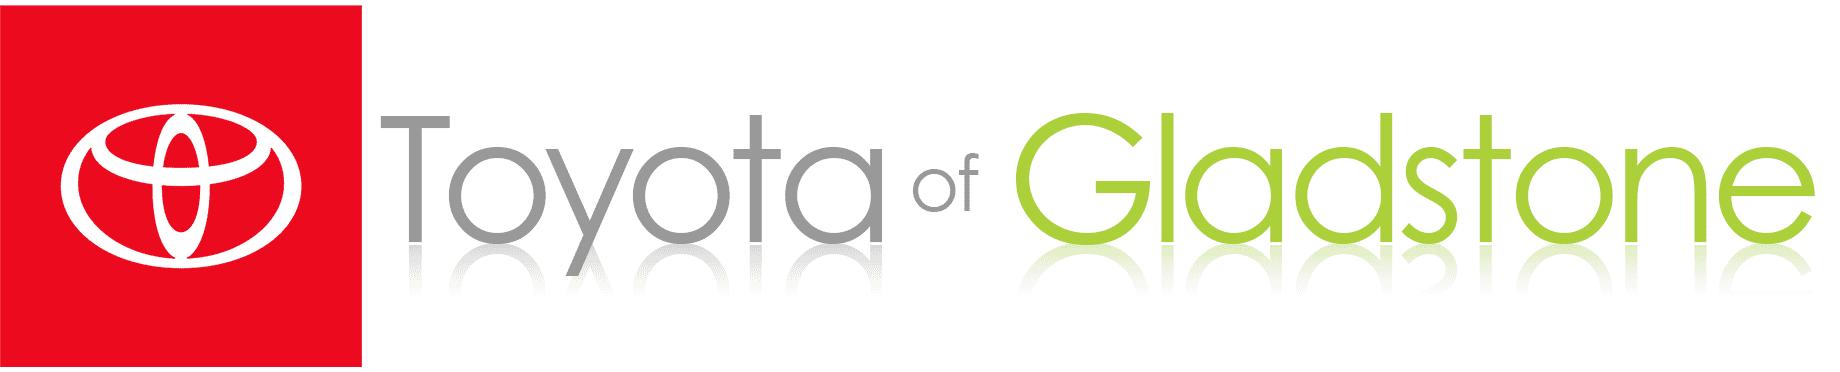 toyota of lake city logo